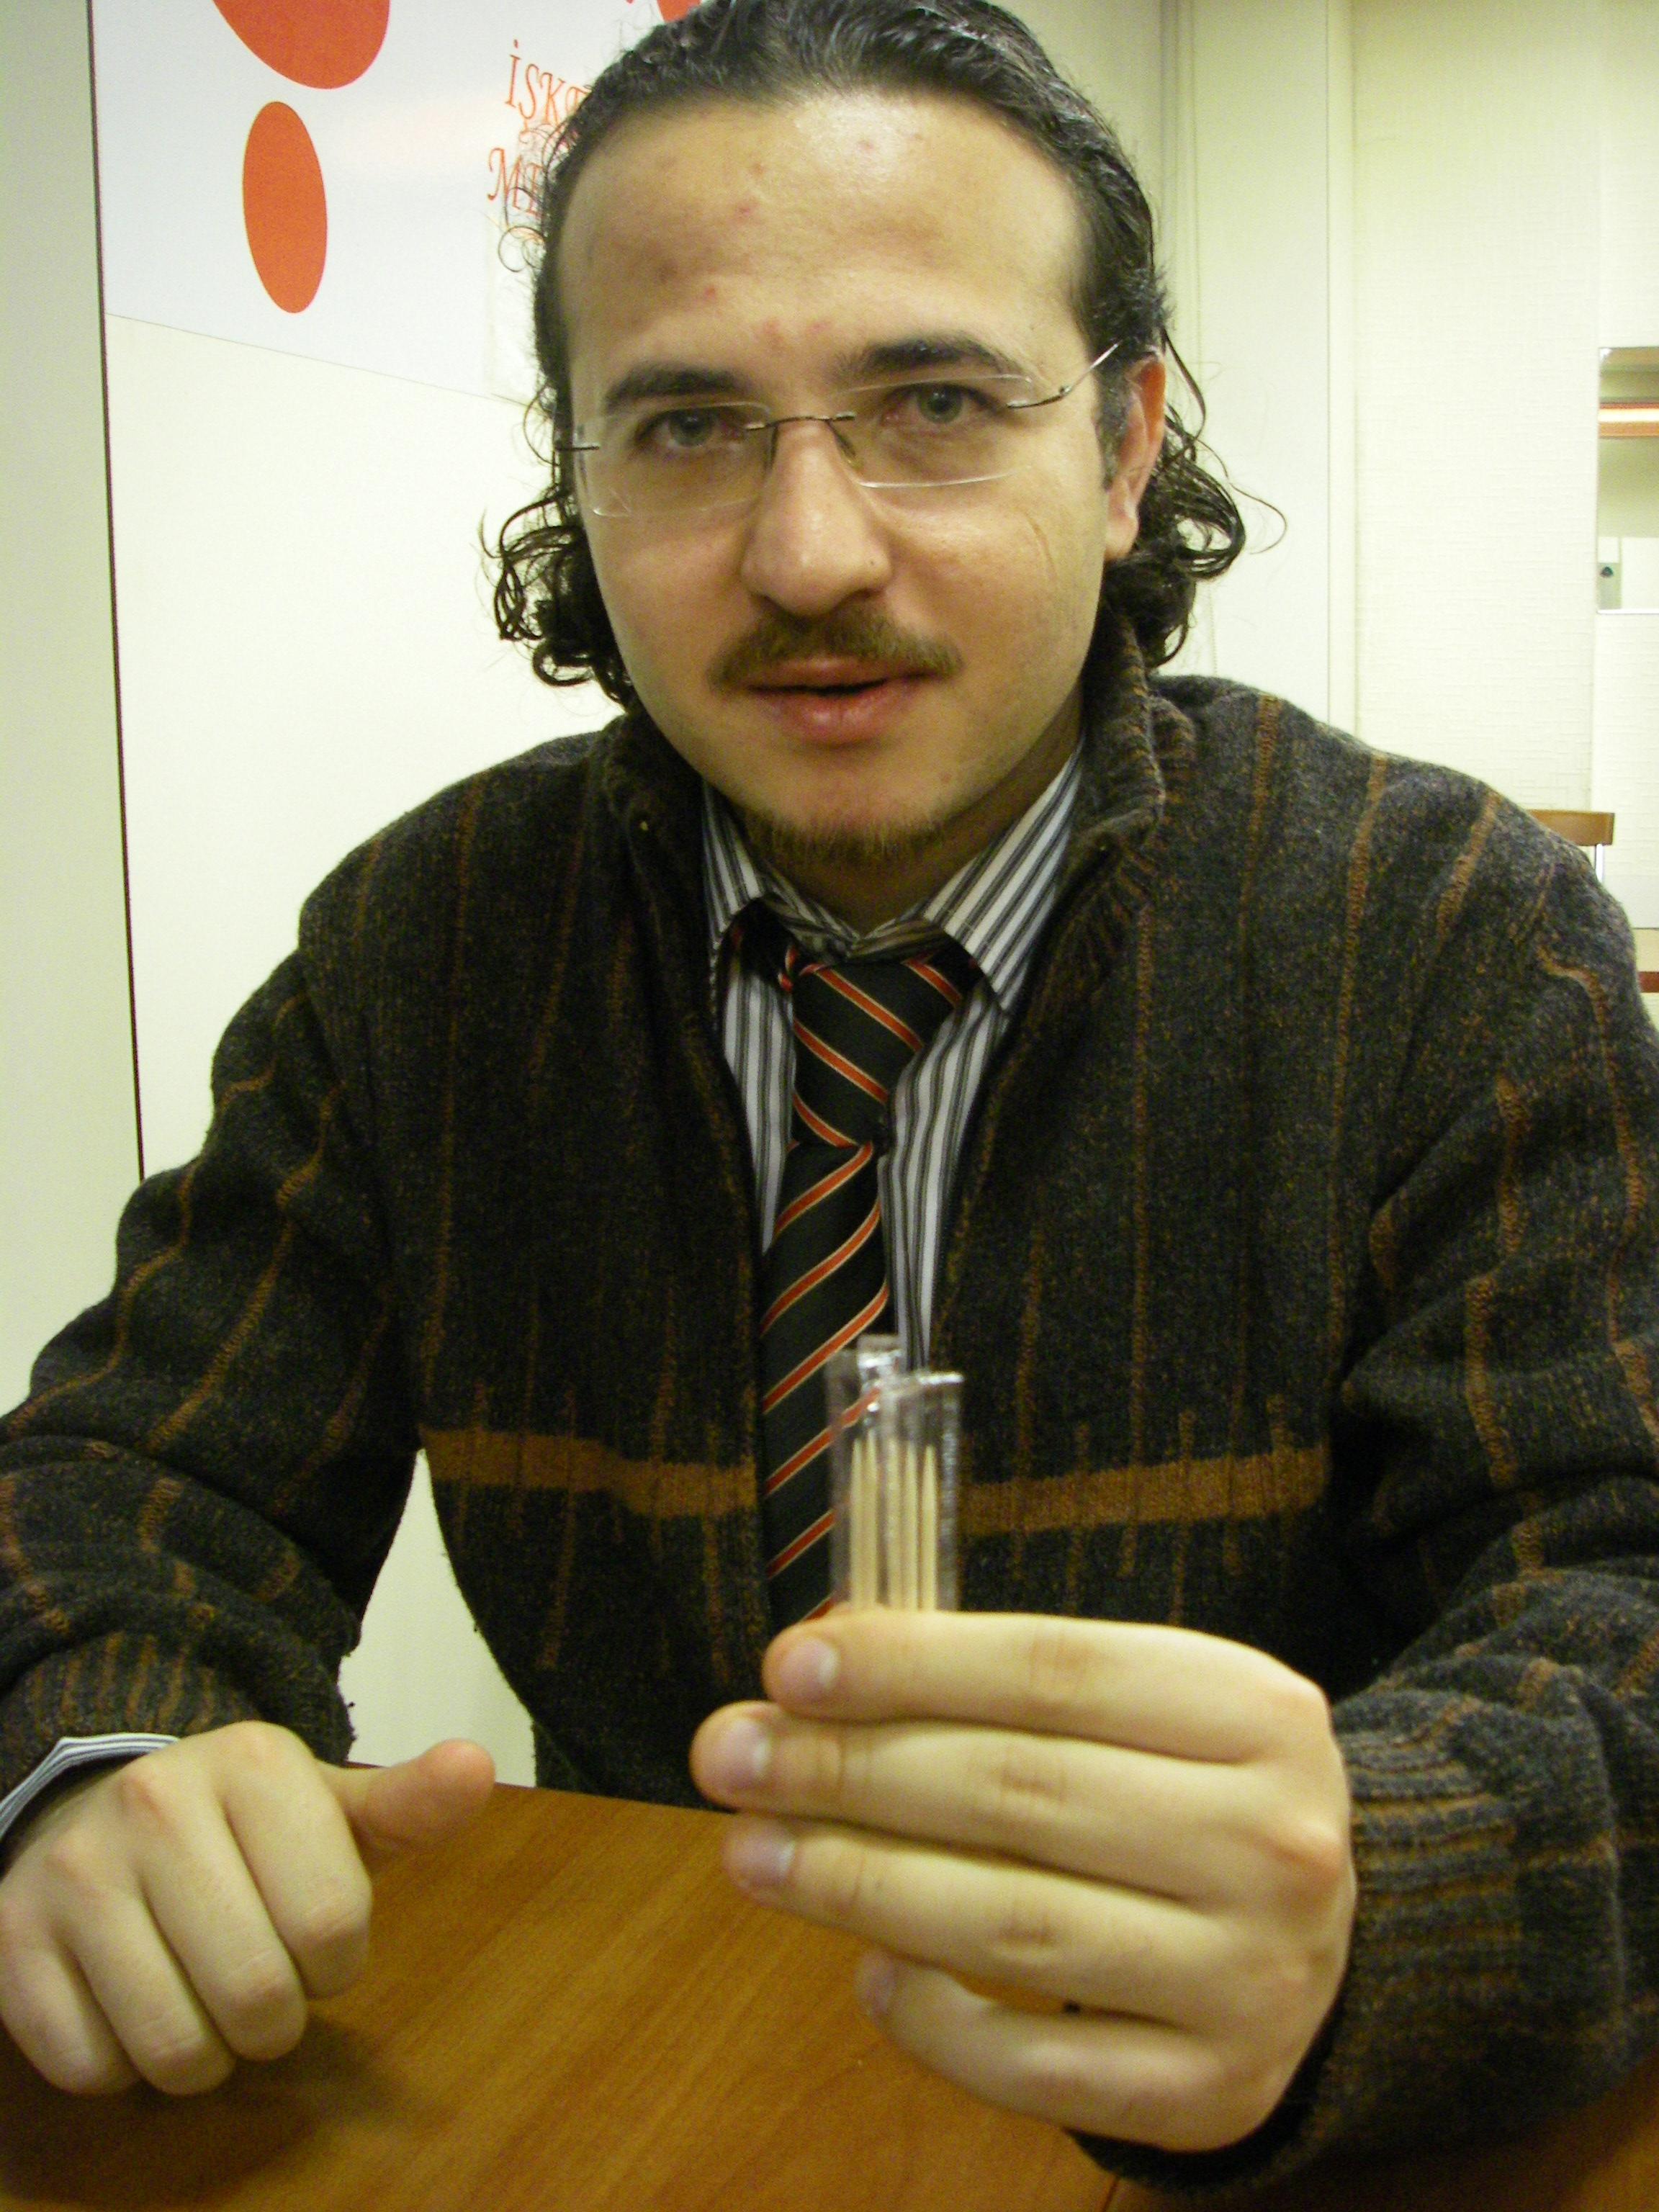 Turkish Toothpick Trick